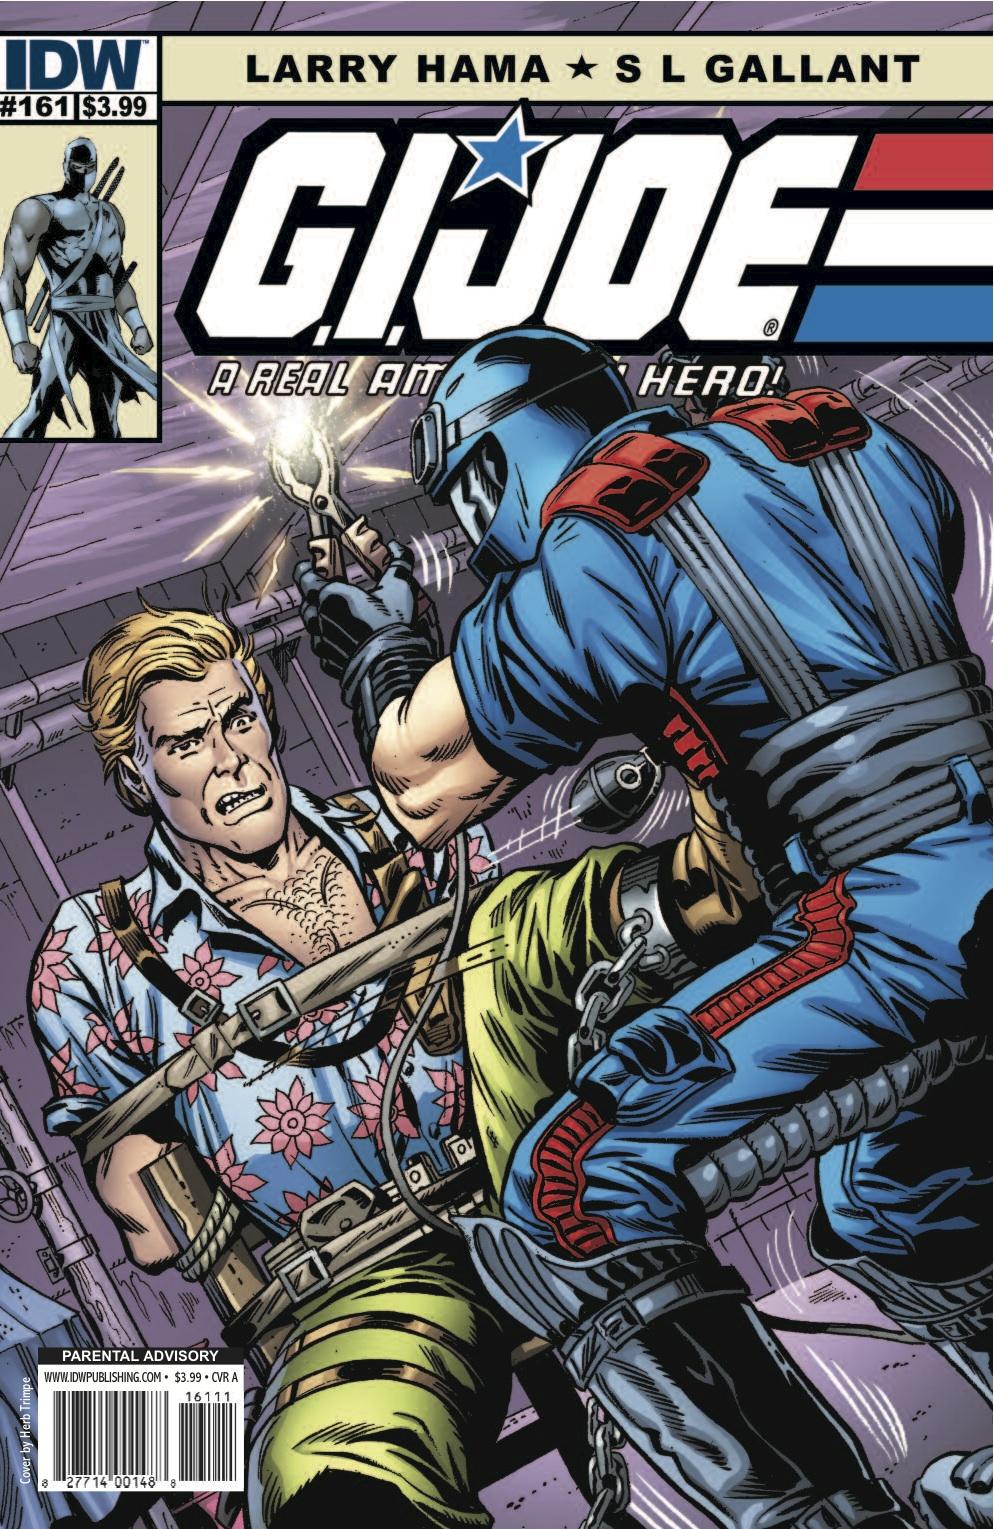 GI Joe A Real American Hero #225 Cover C IDW